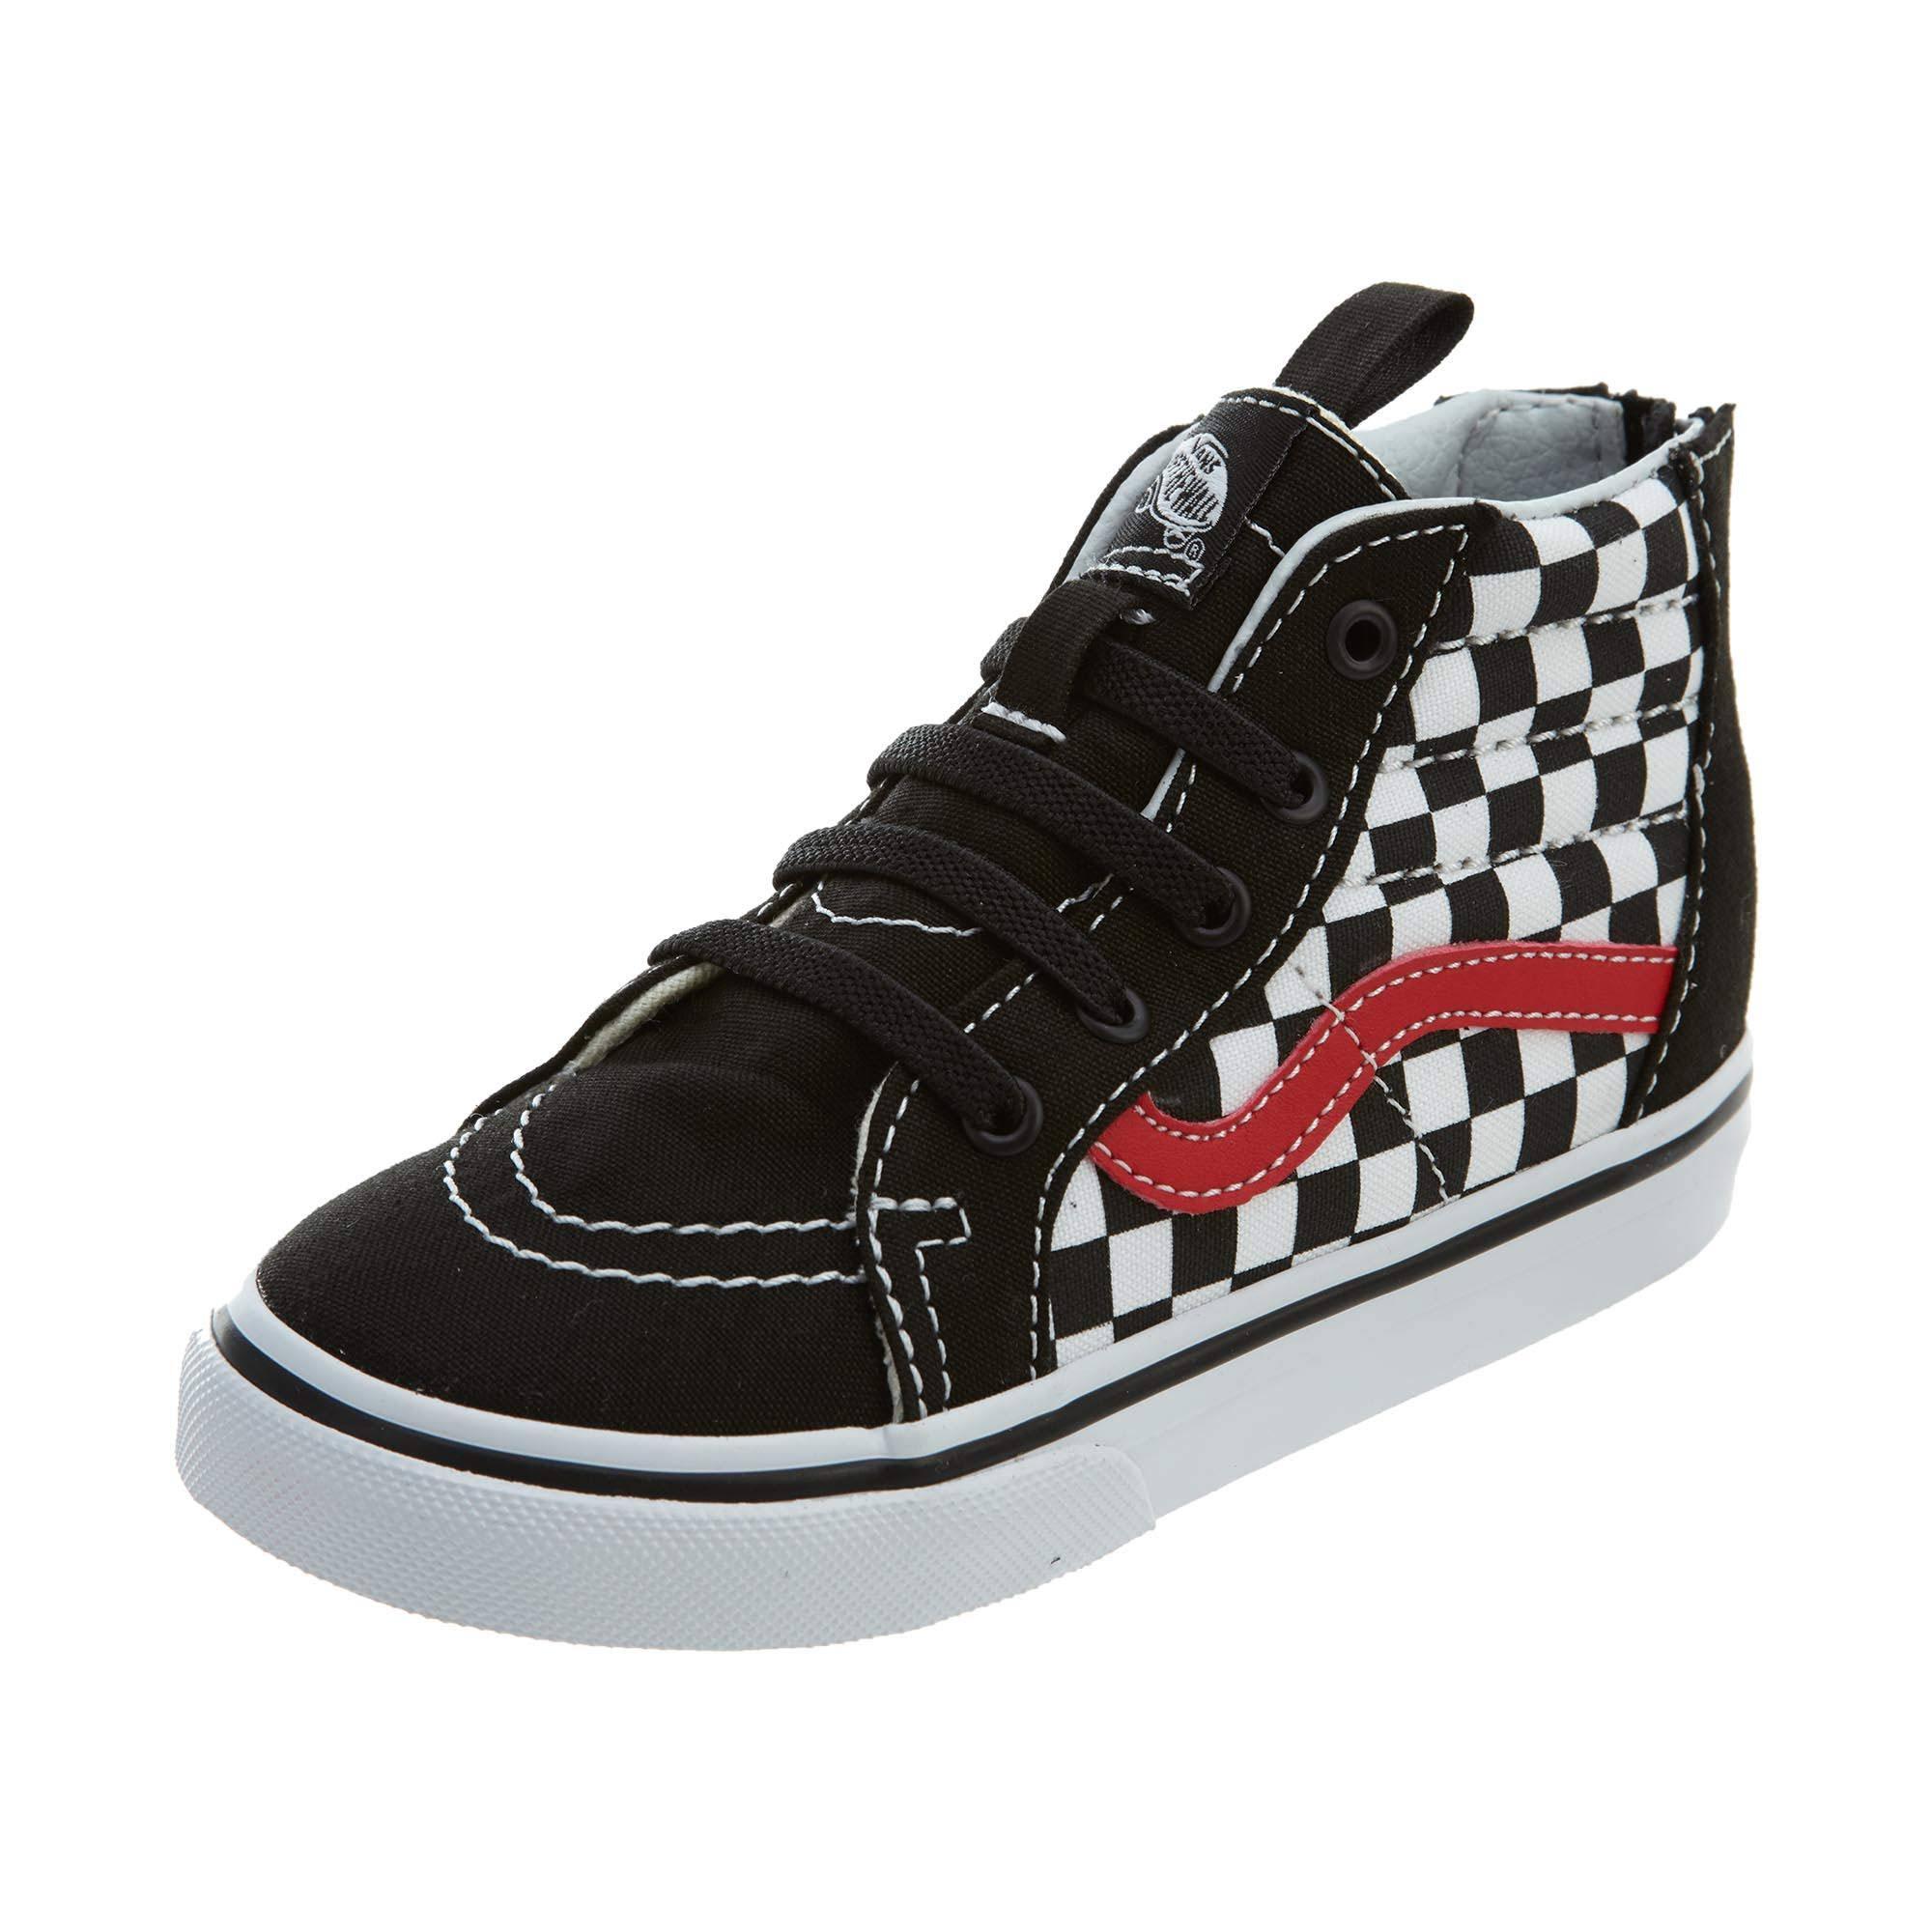 Black red Style Toddlers Sk8 Vans Zip Vn0a32r3 hi 8 qwBcFcKWy